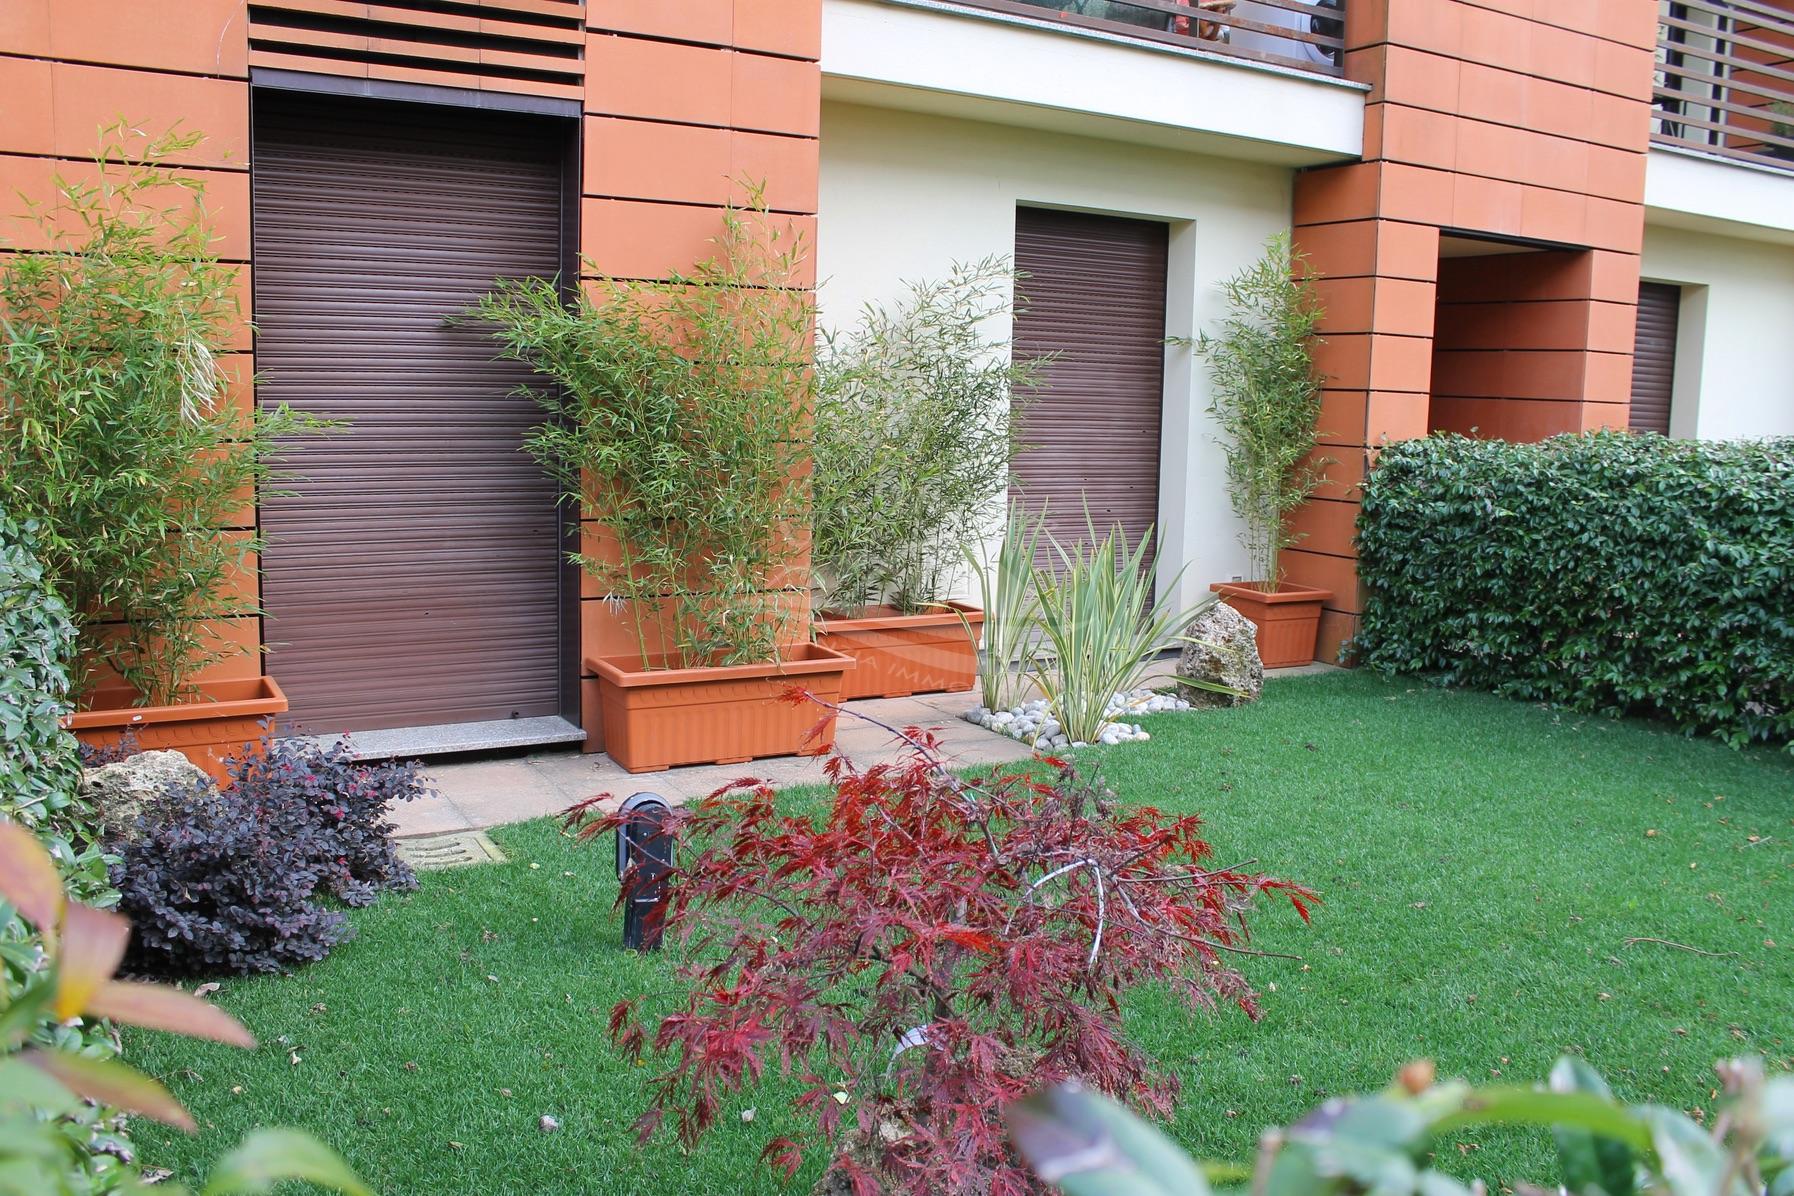 Bilocale con giardino a Cantu'